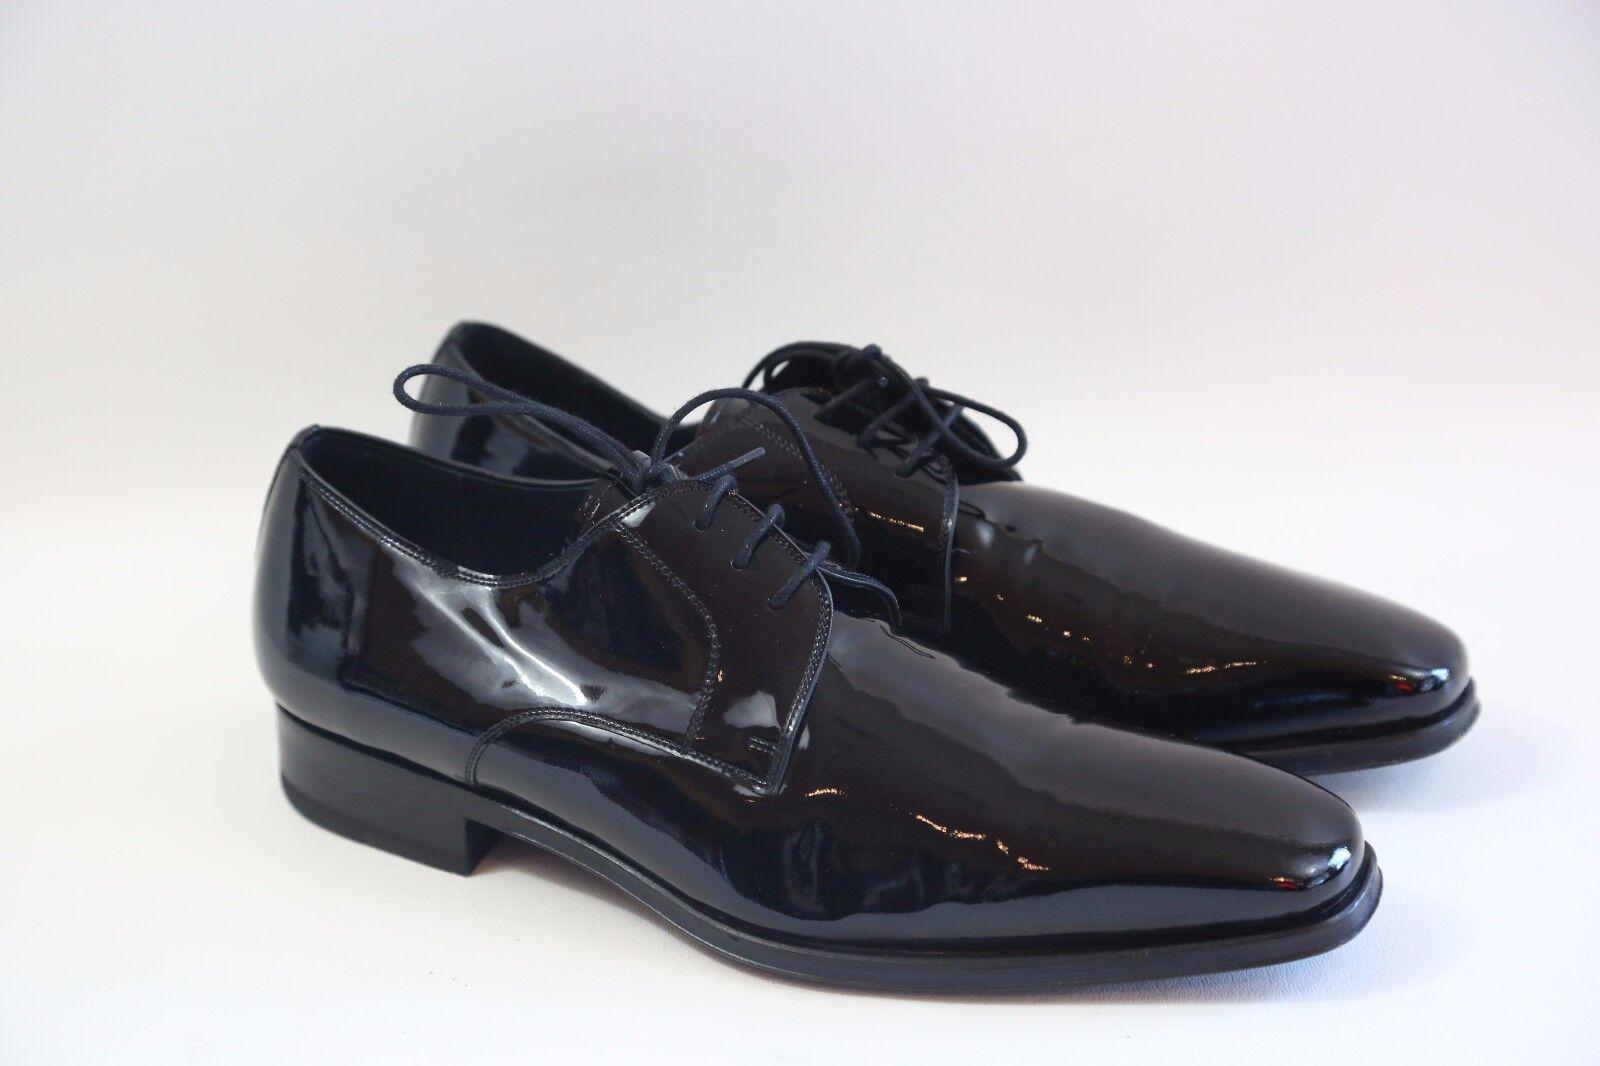 = Magnanni 'Dante' Plain Toe Tuxedo Scarpe Taglia 9 M  retail  299